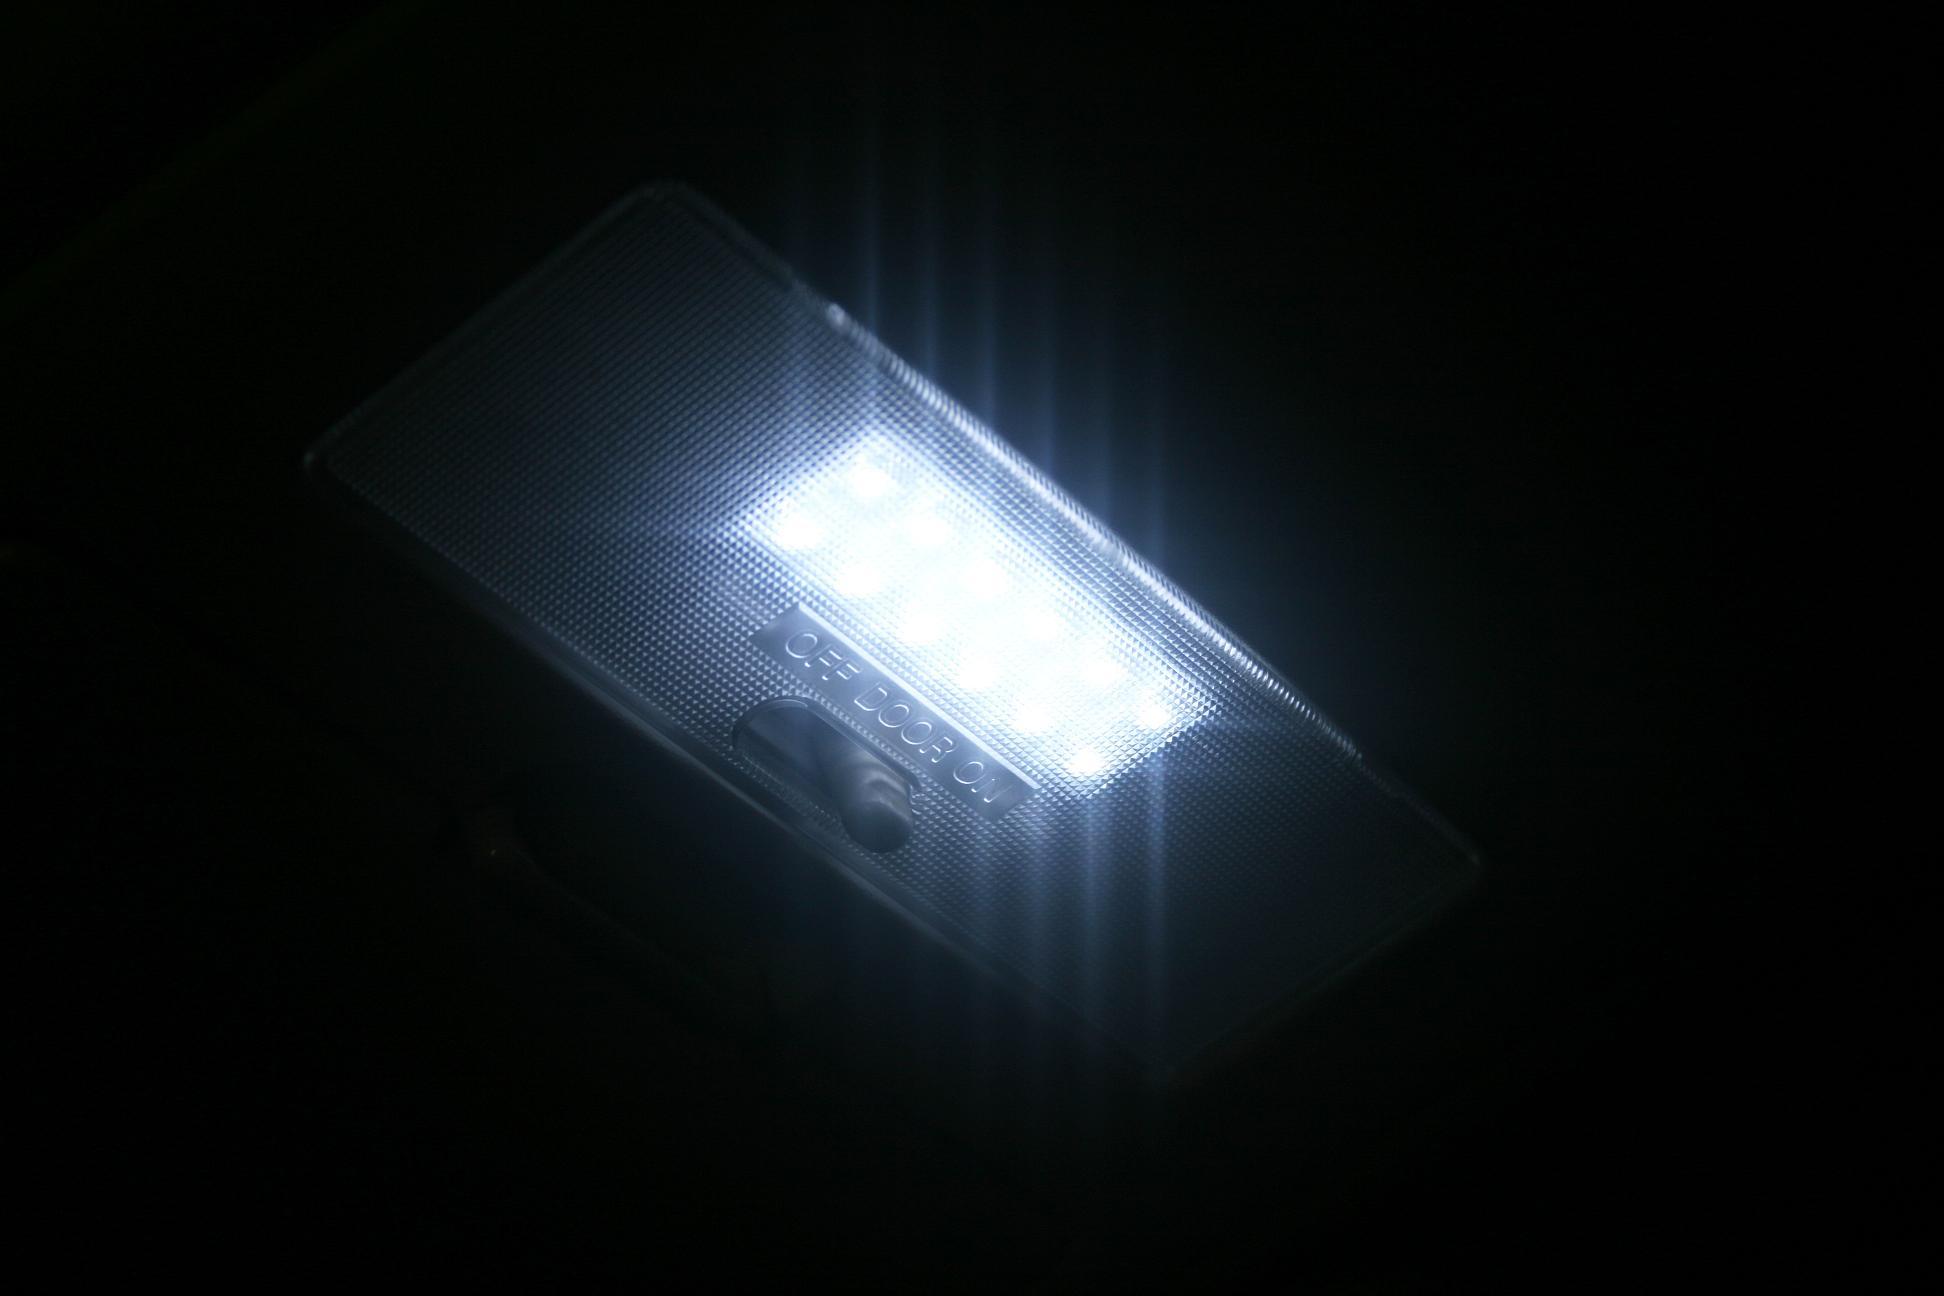 【TOYOTA】【クラウン】 JZS171,JZS173 LEDルームランプ(白色) 72発【メール便可】